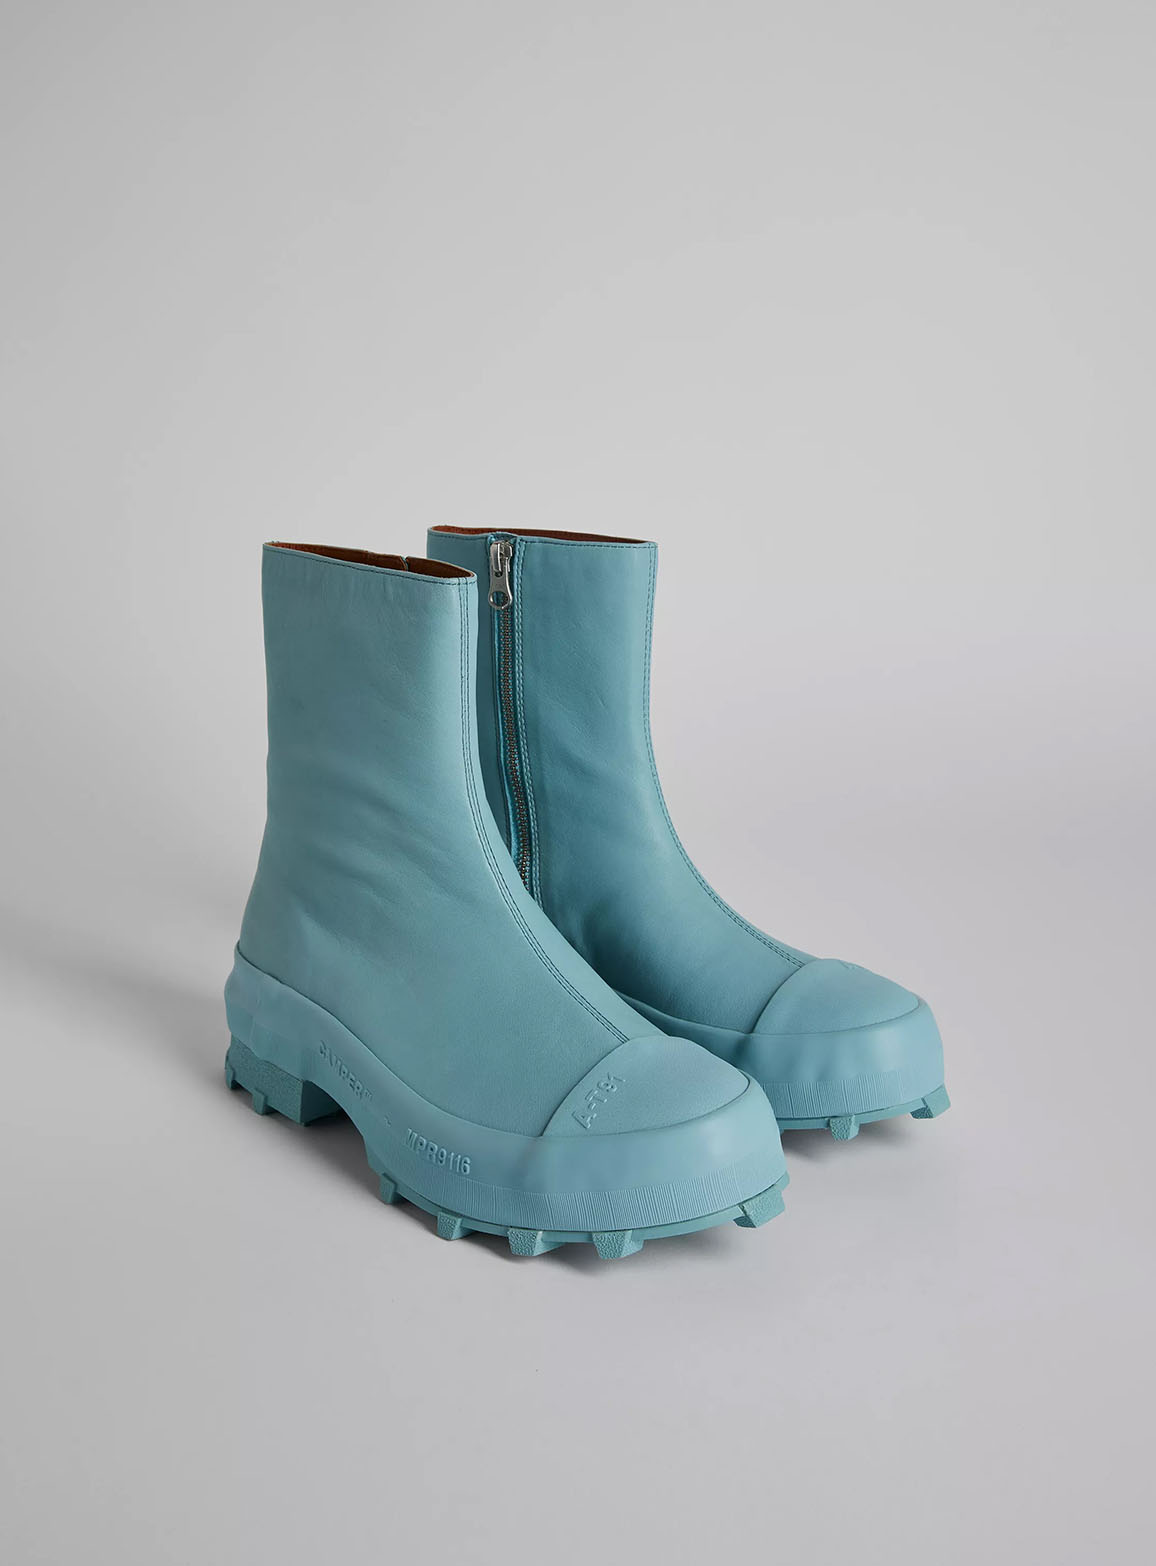 Traktori blue boots